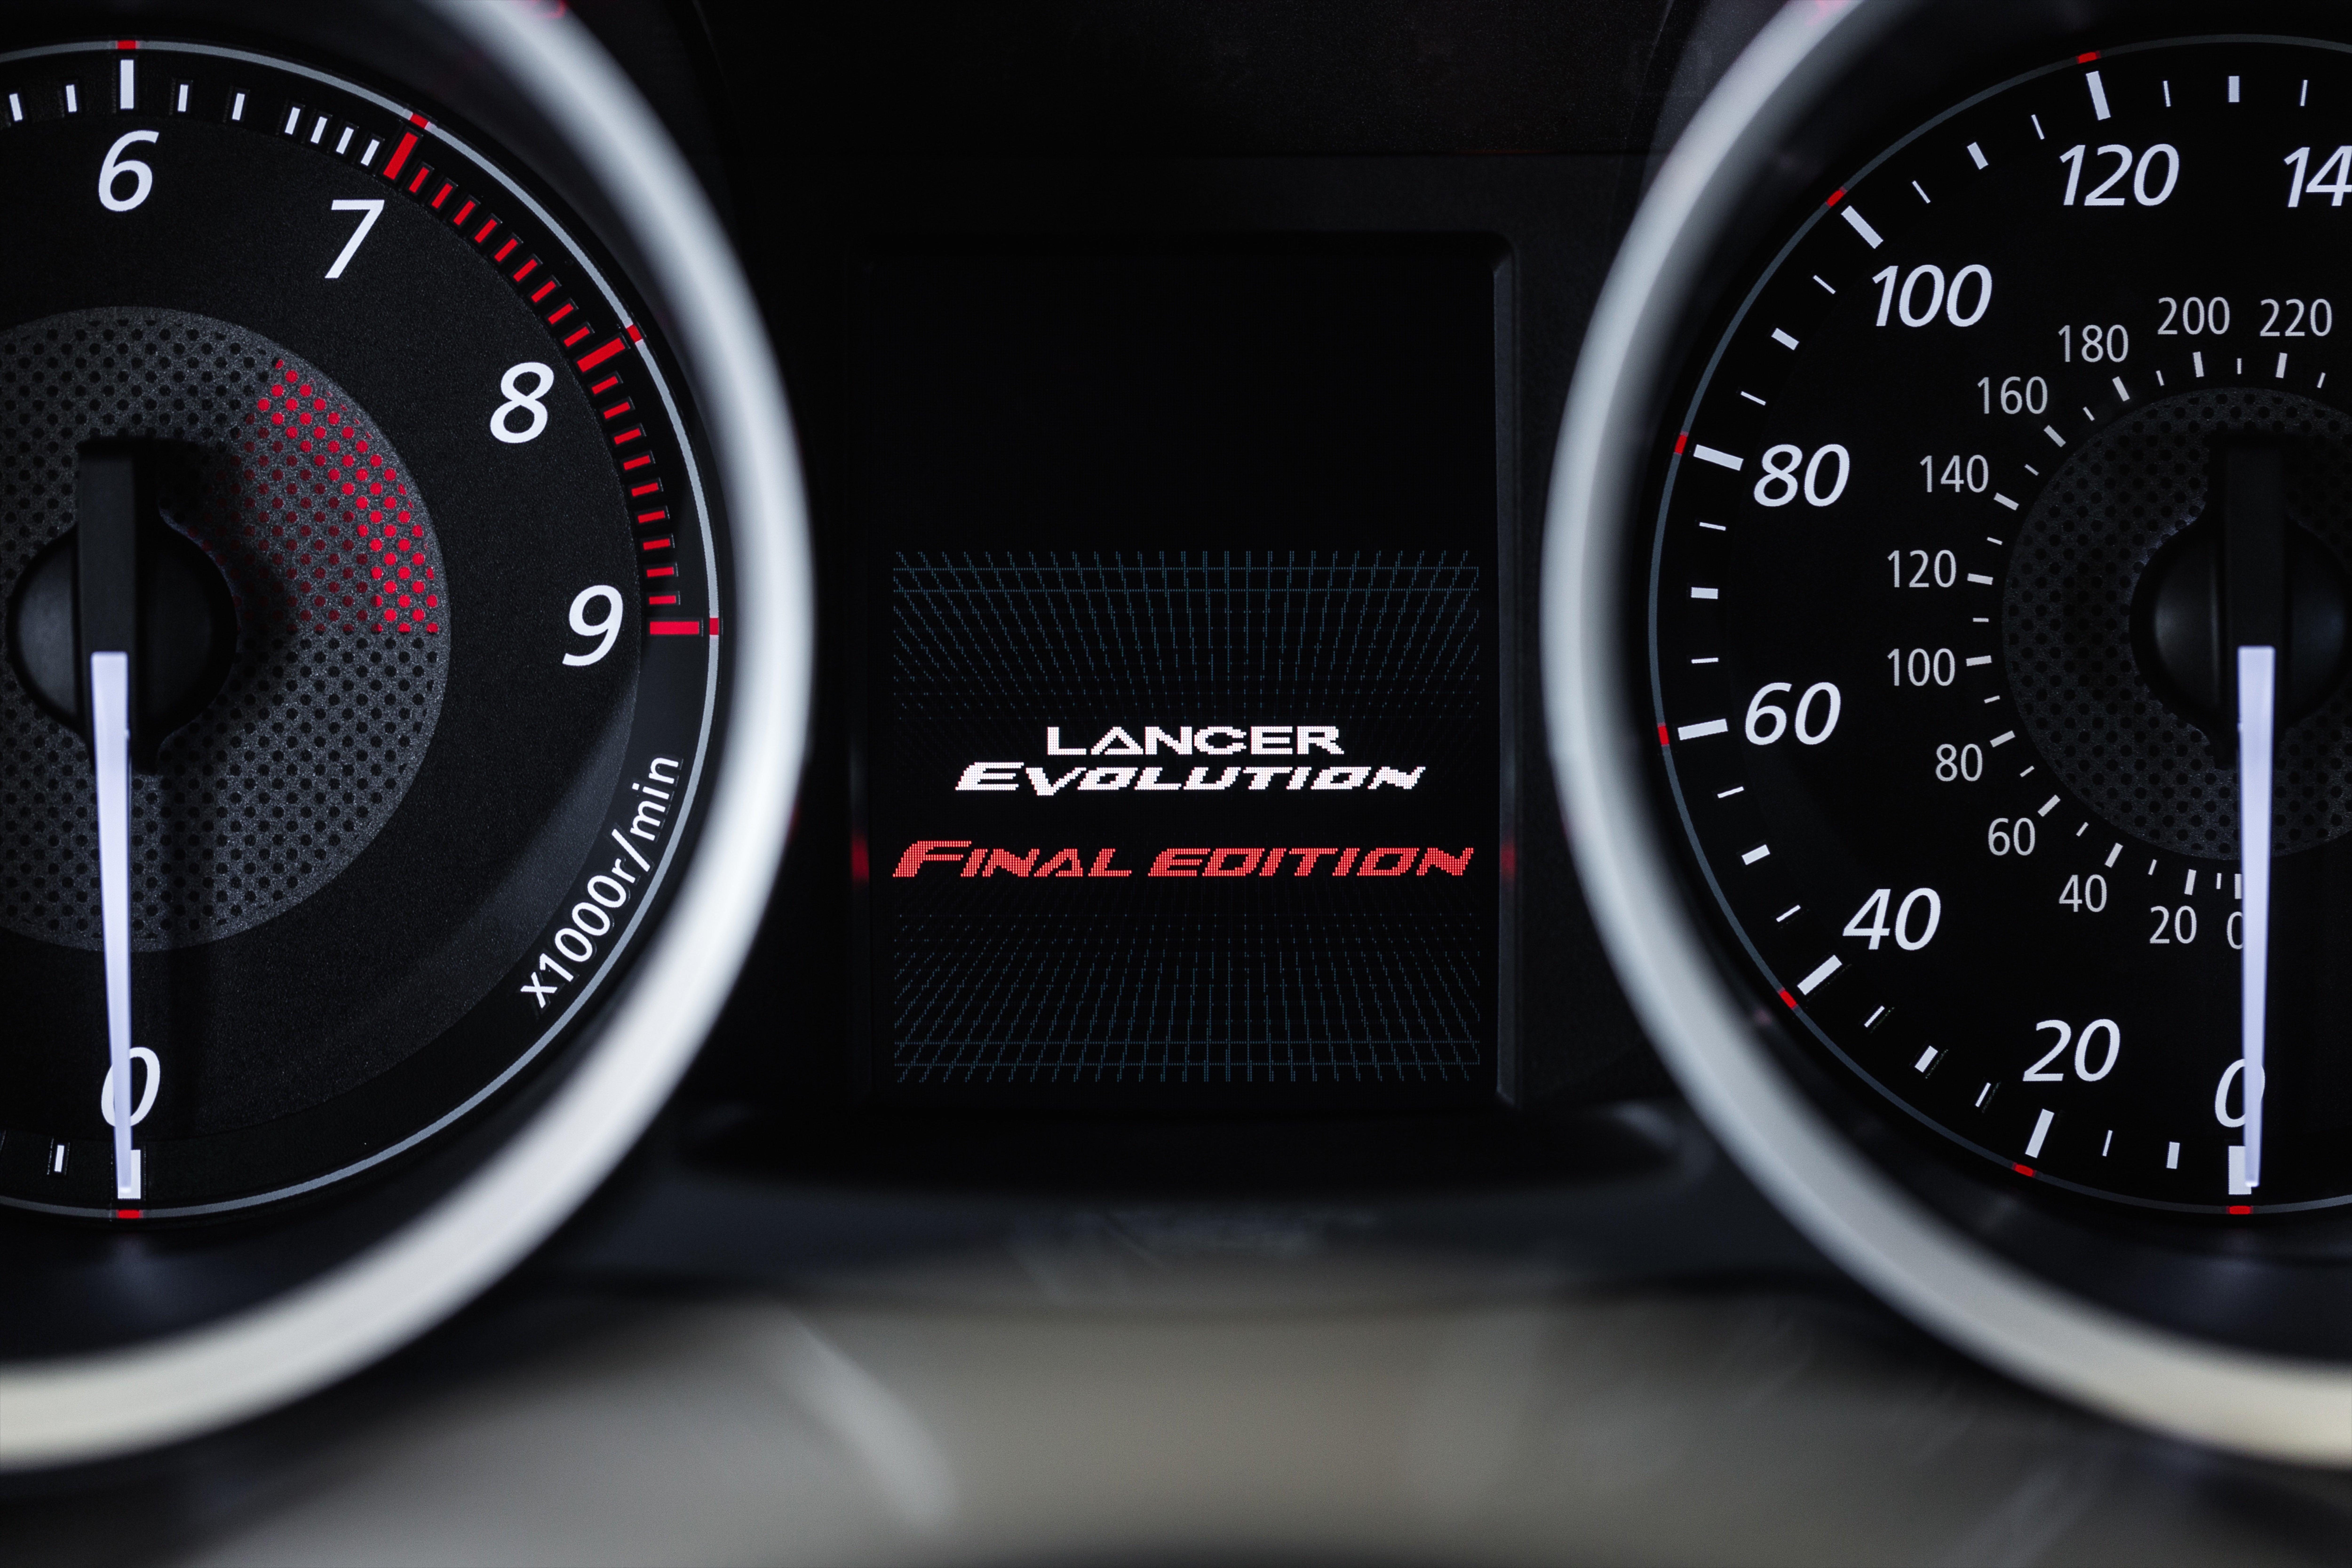 Farewell to Mitsubishi Evo X with 303 hp Final Edition Image #388259